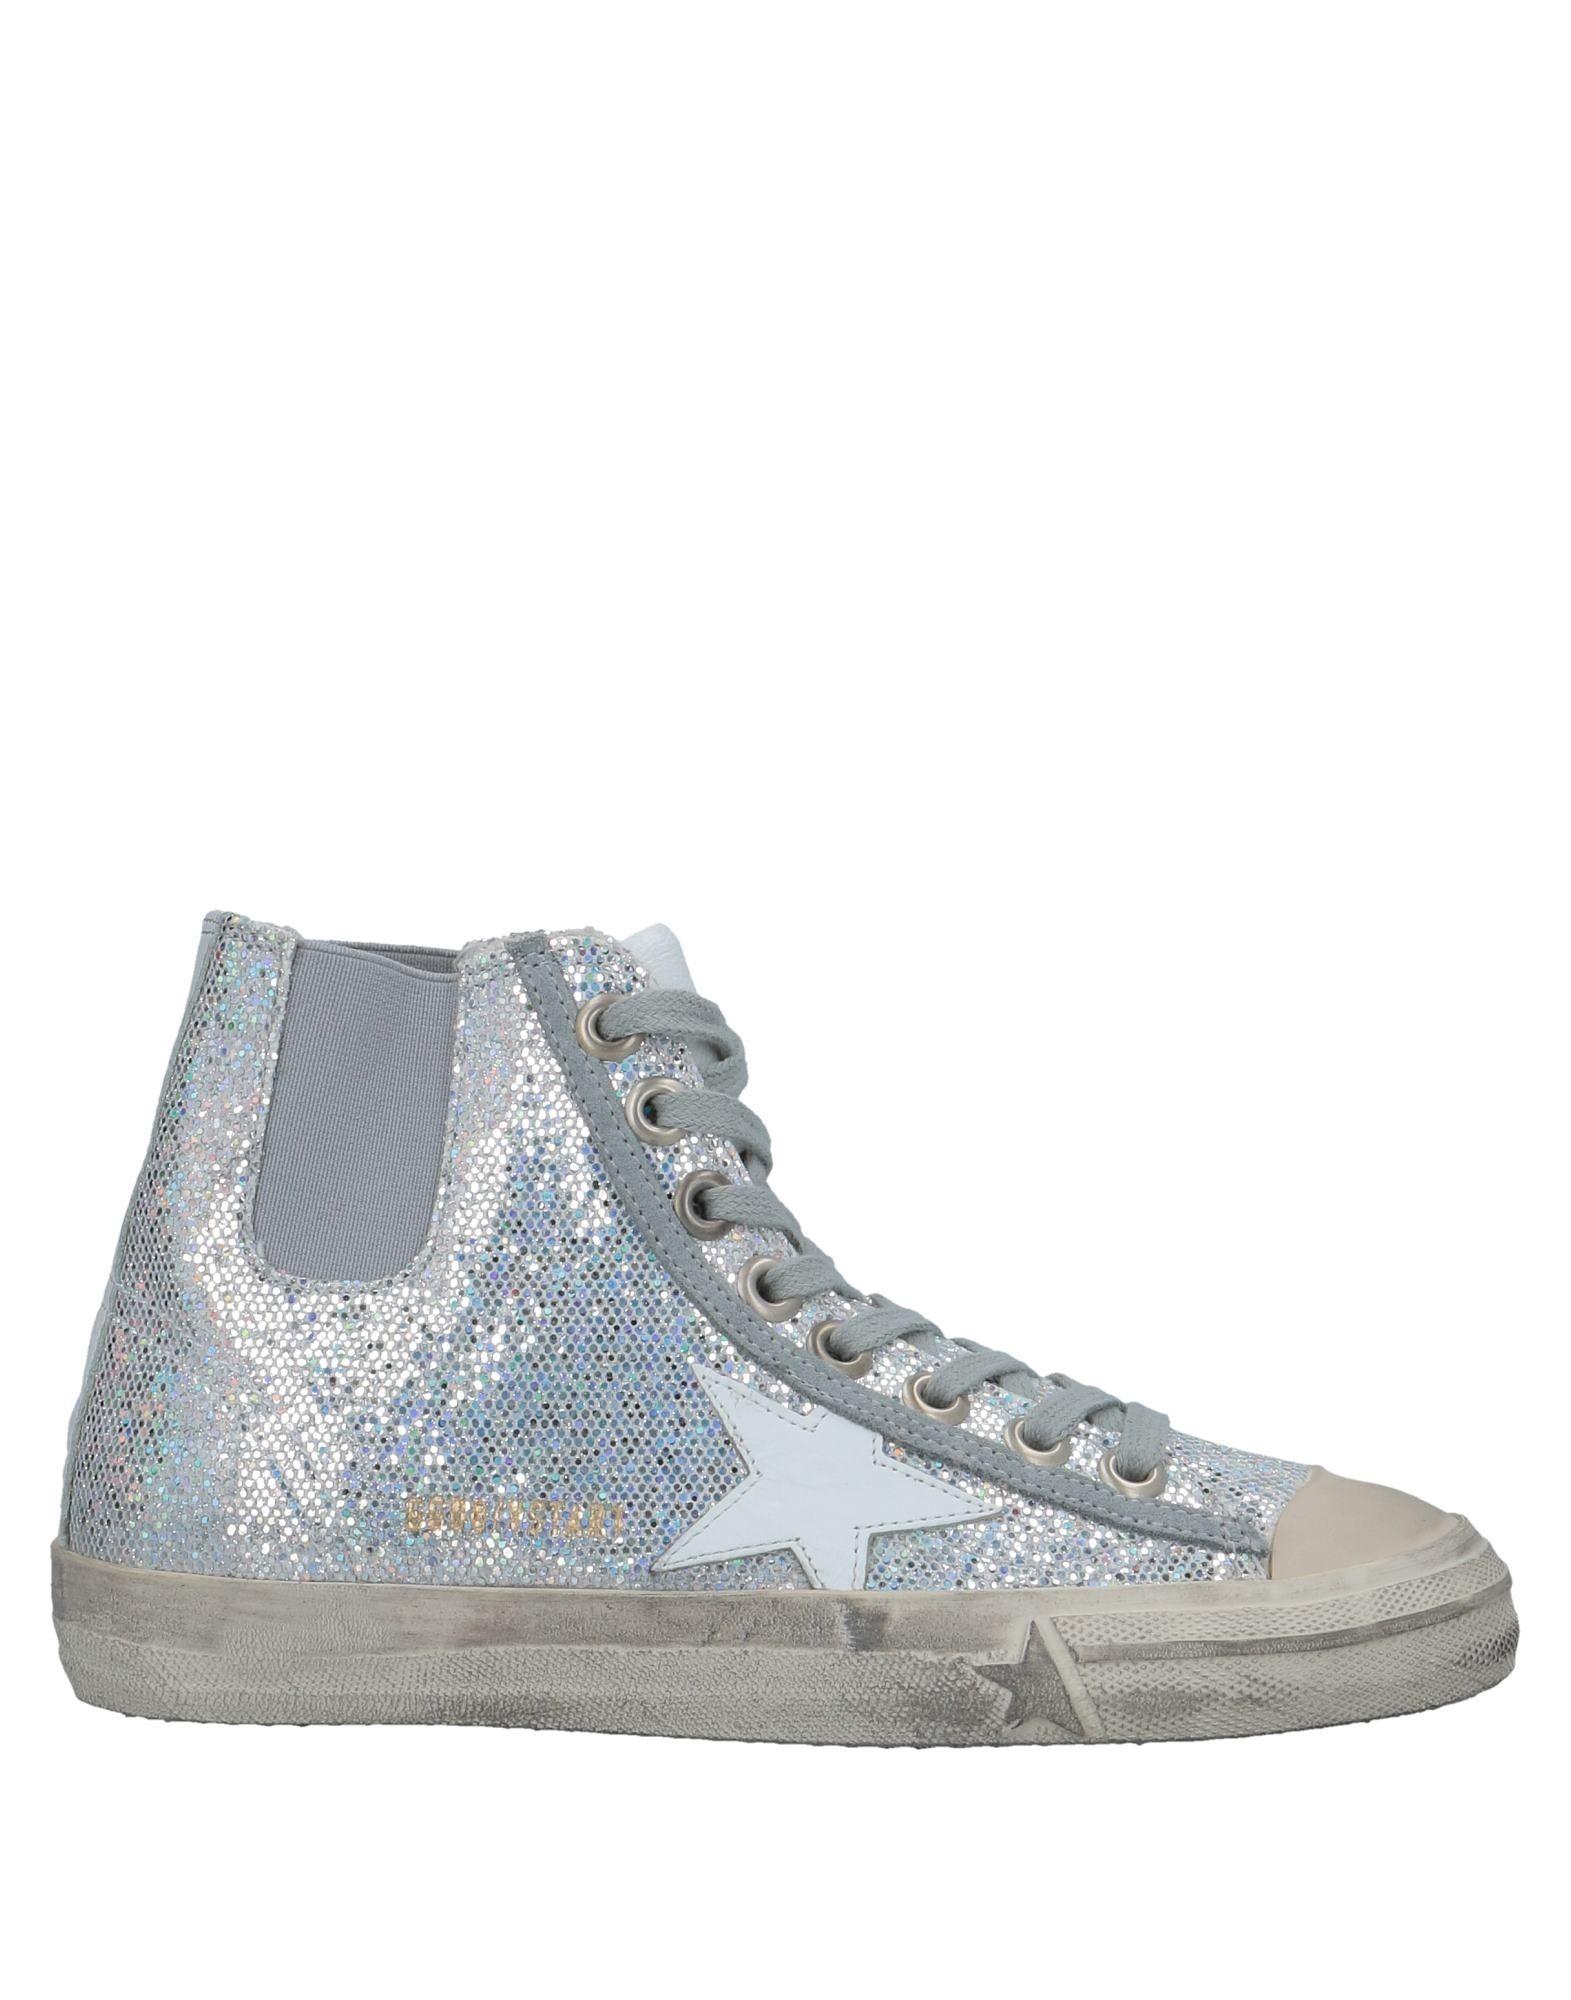 Sneakers Golden Goose Deluxe Brand Donna - 11506993ID